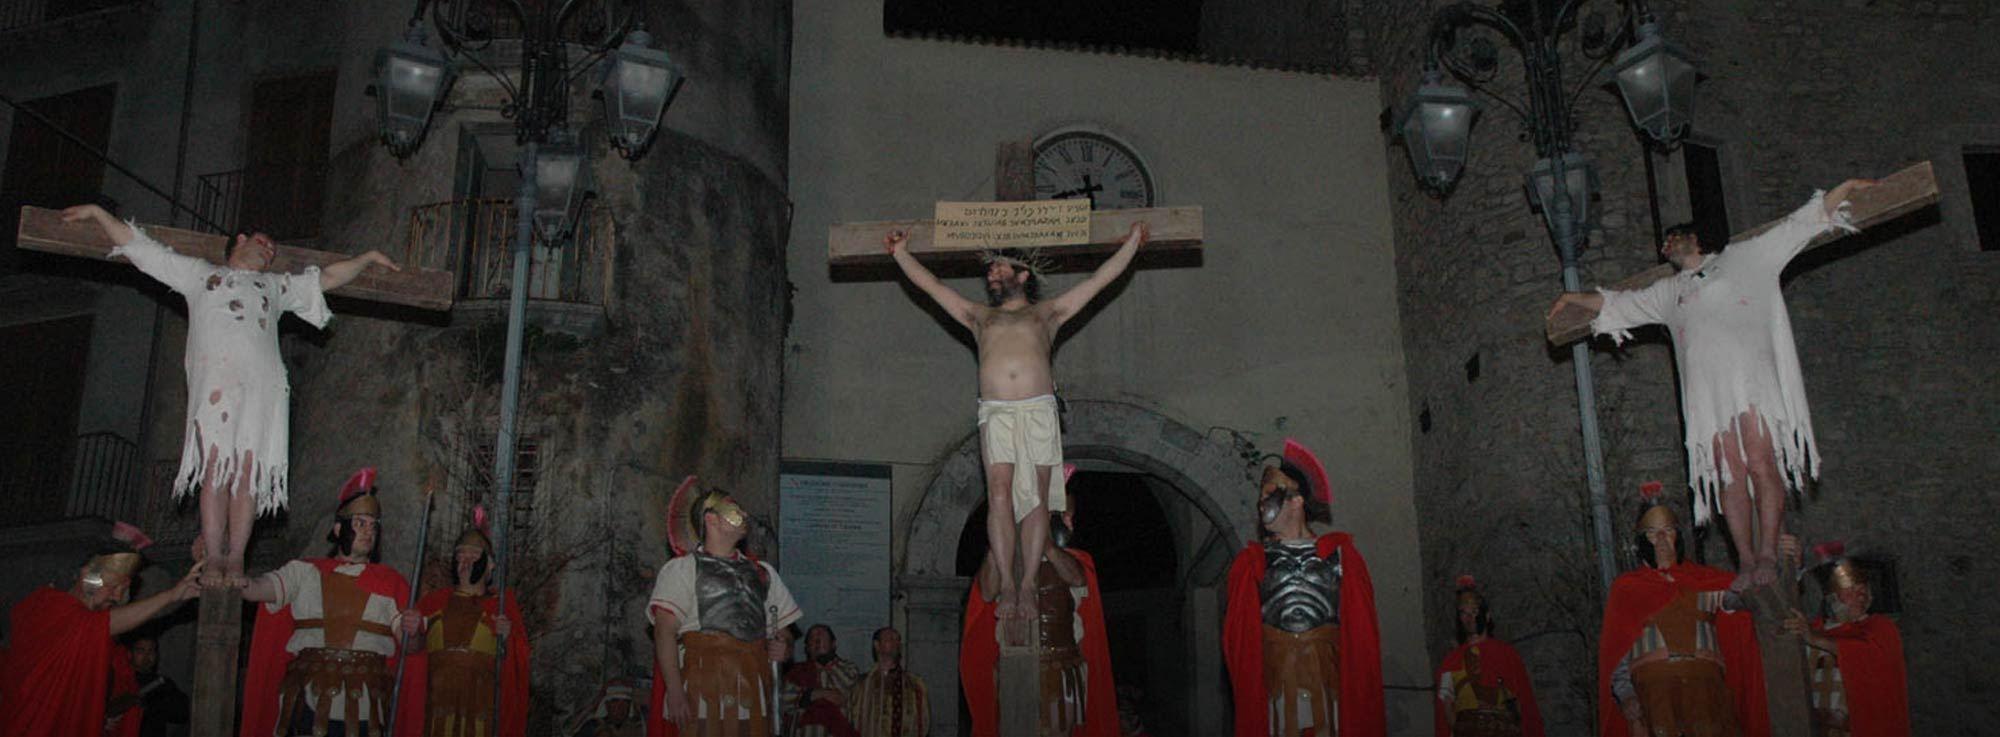 Fragagnano: Passio Christi Freganianum